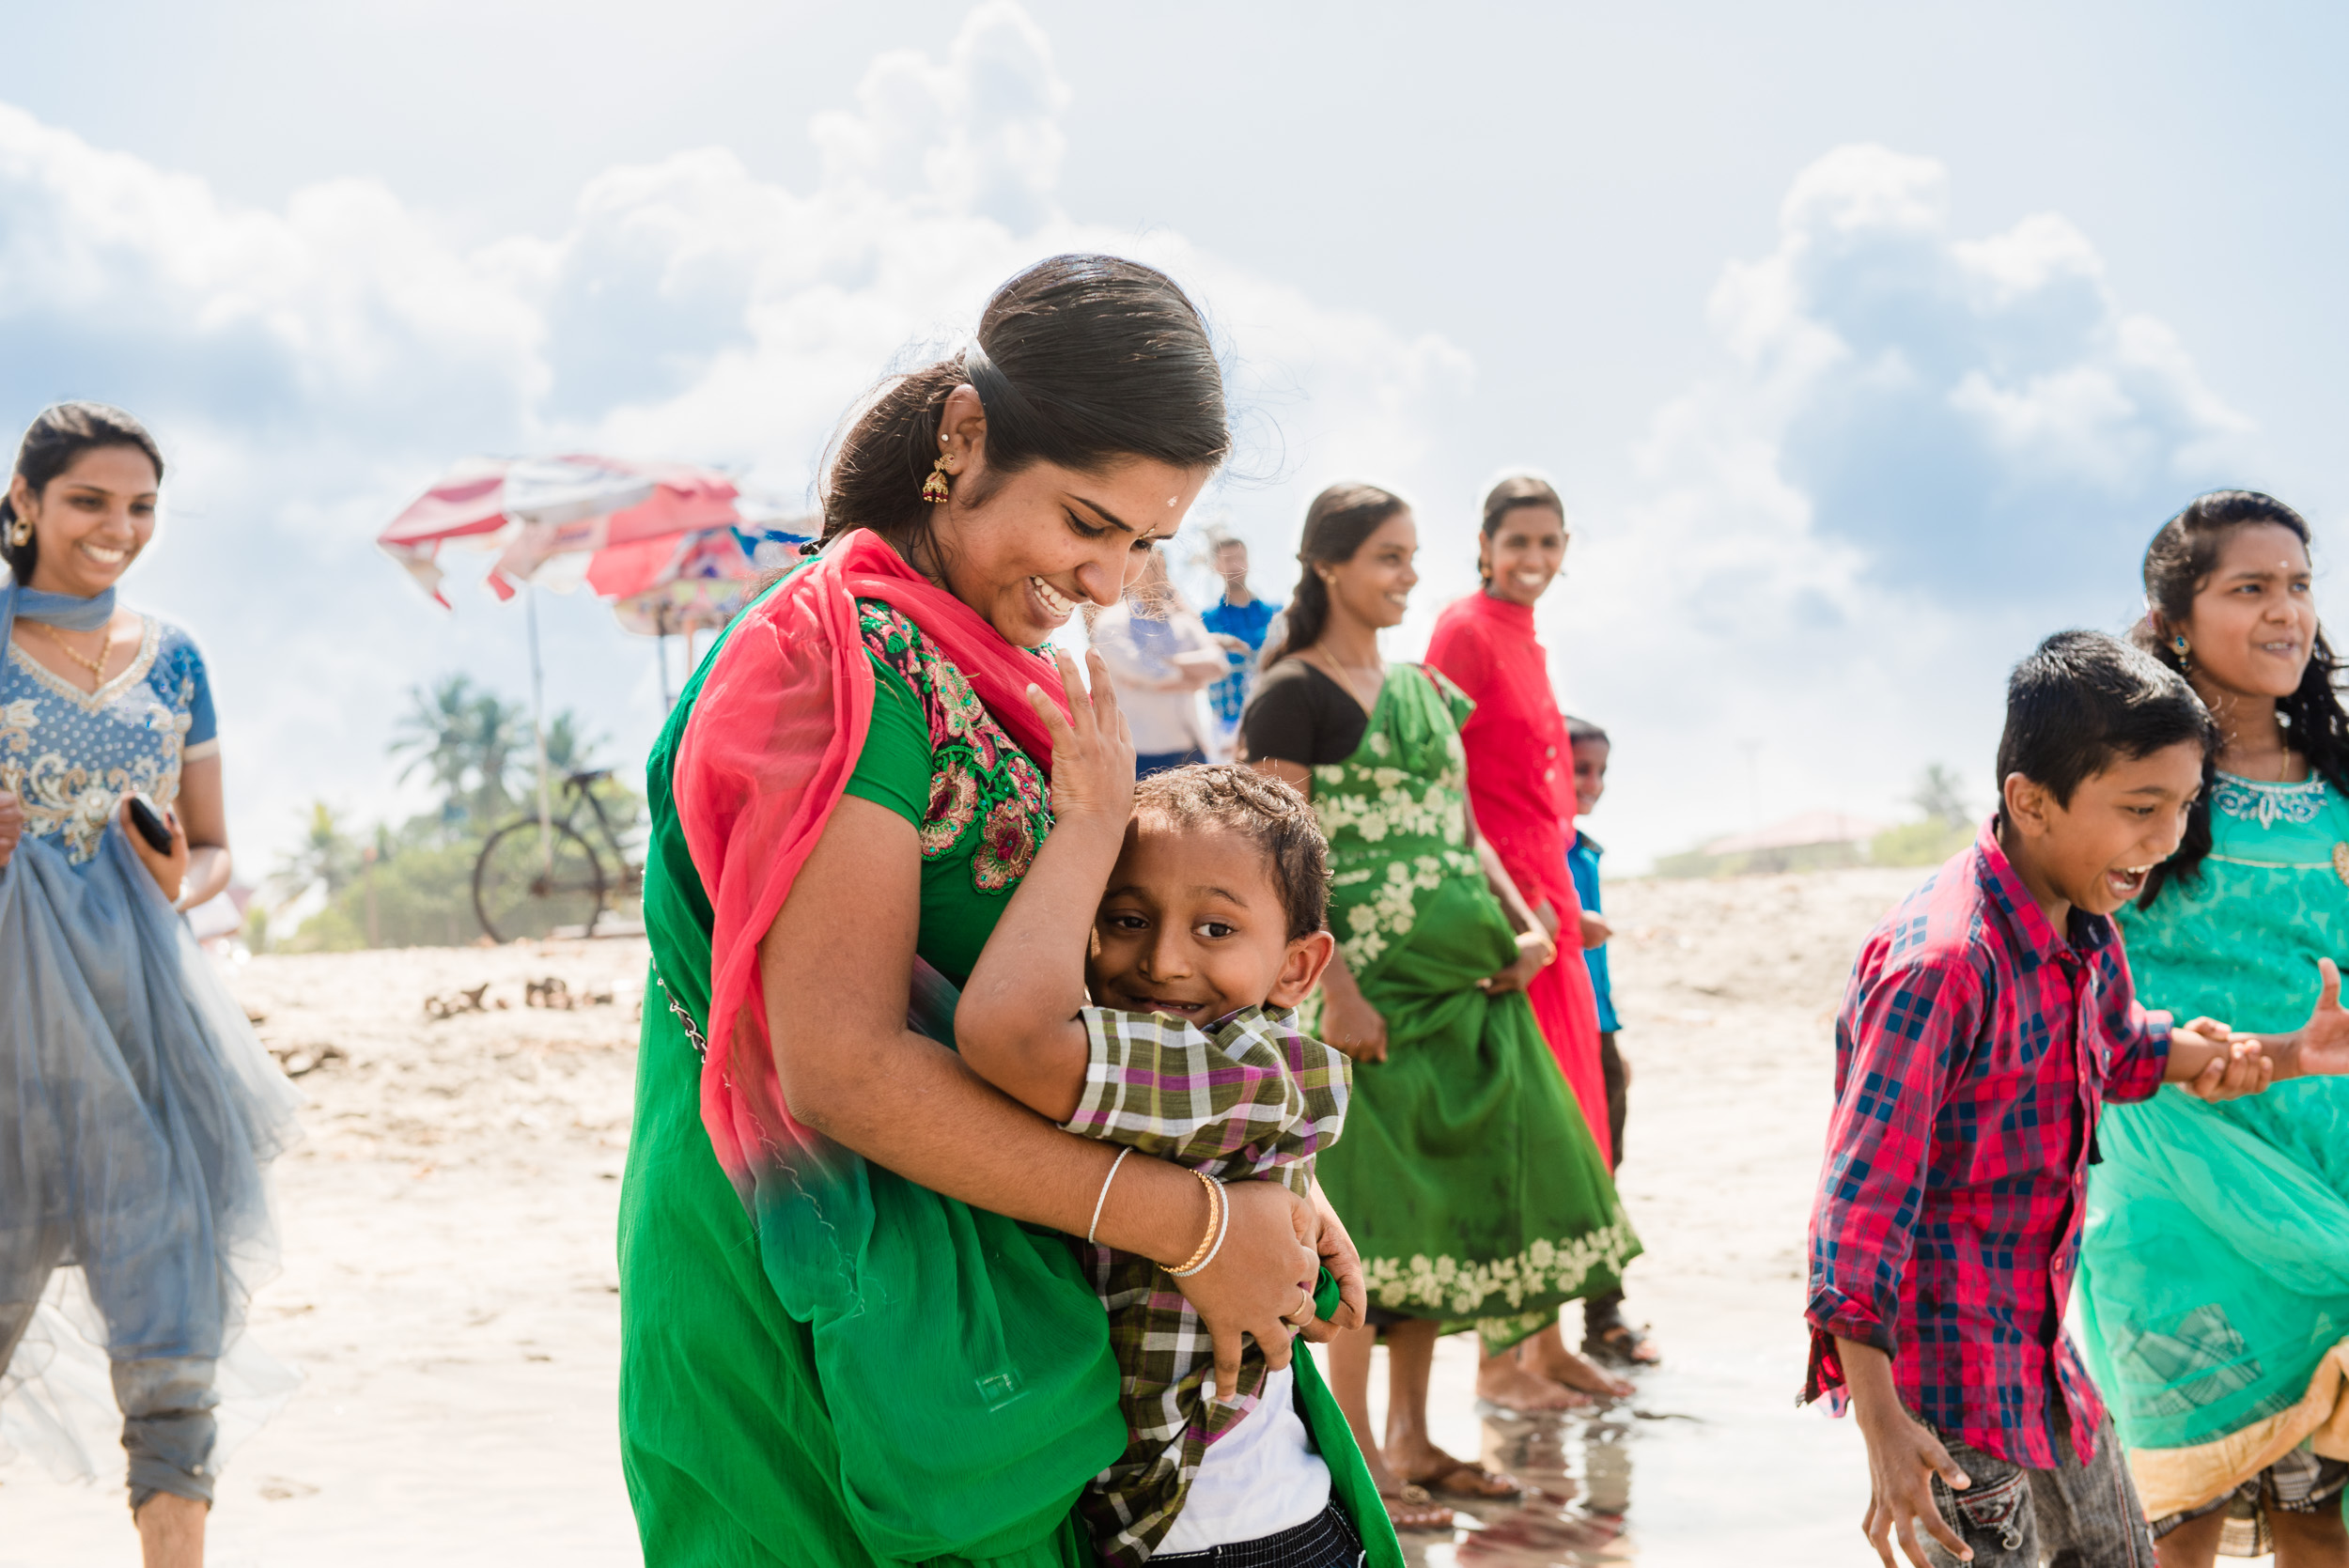 Cleft-Kinder-Hilfe Schweiz _NP08816.jpg